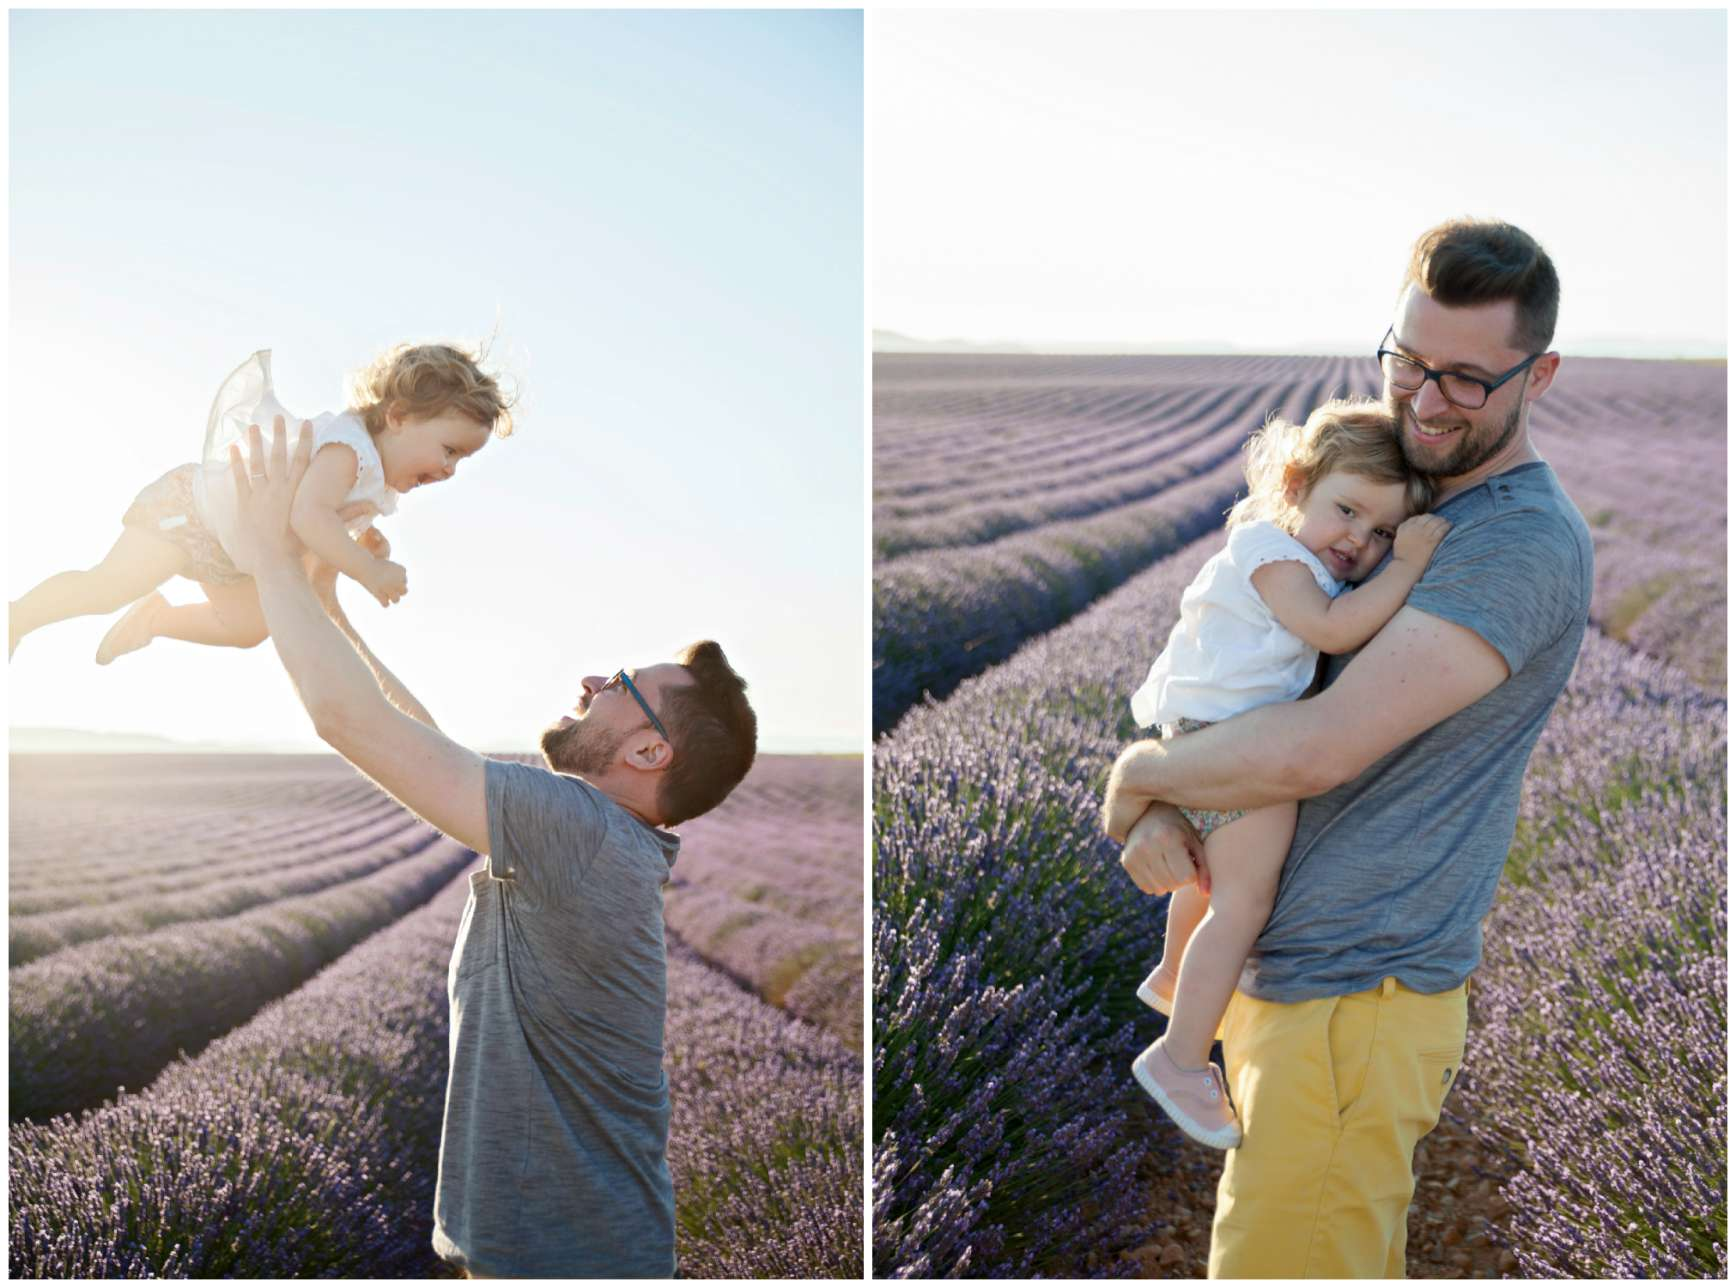 Lavender-fields-Provence-claraBmartin16